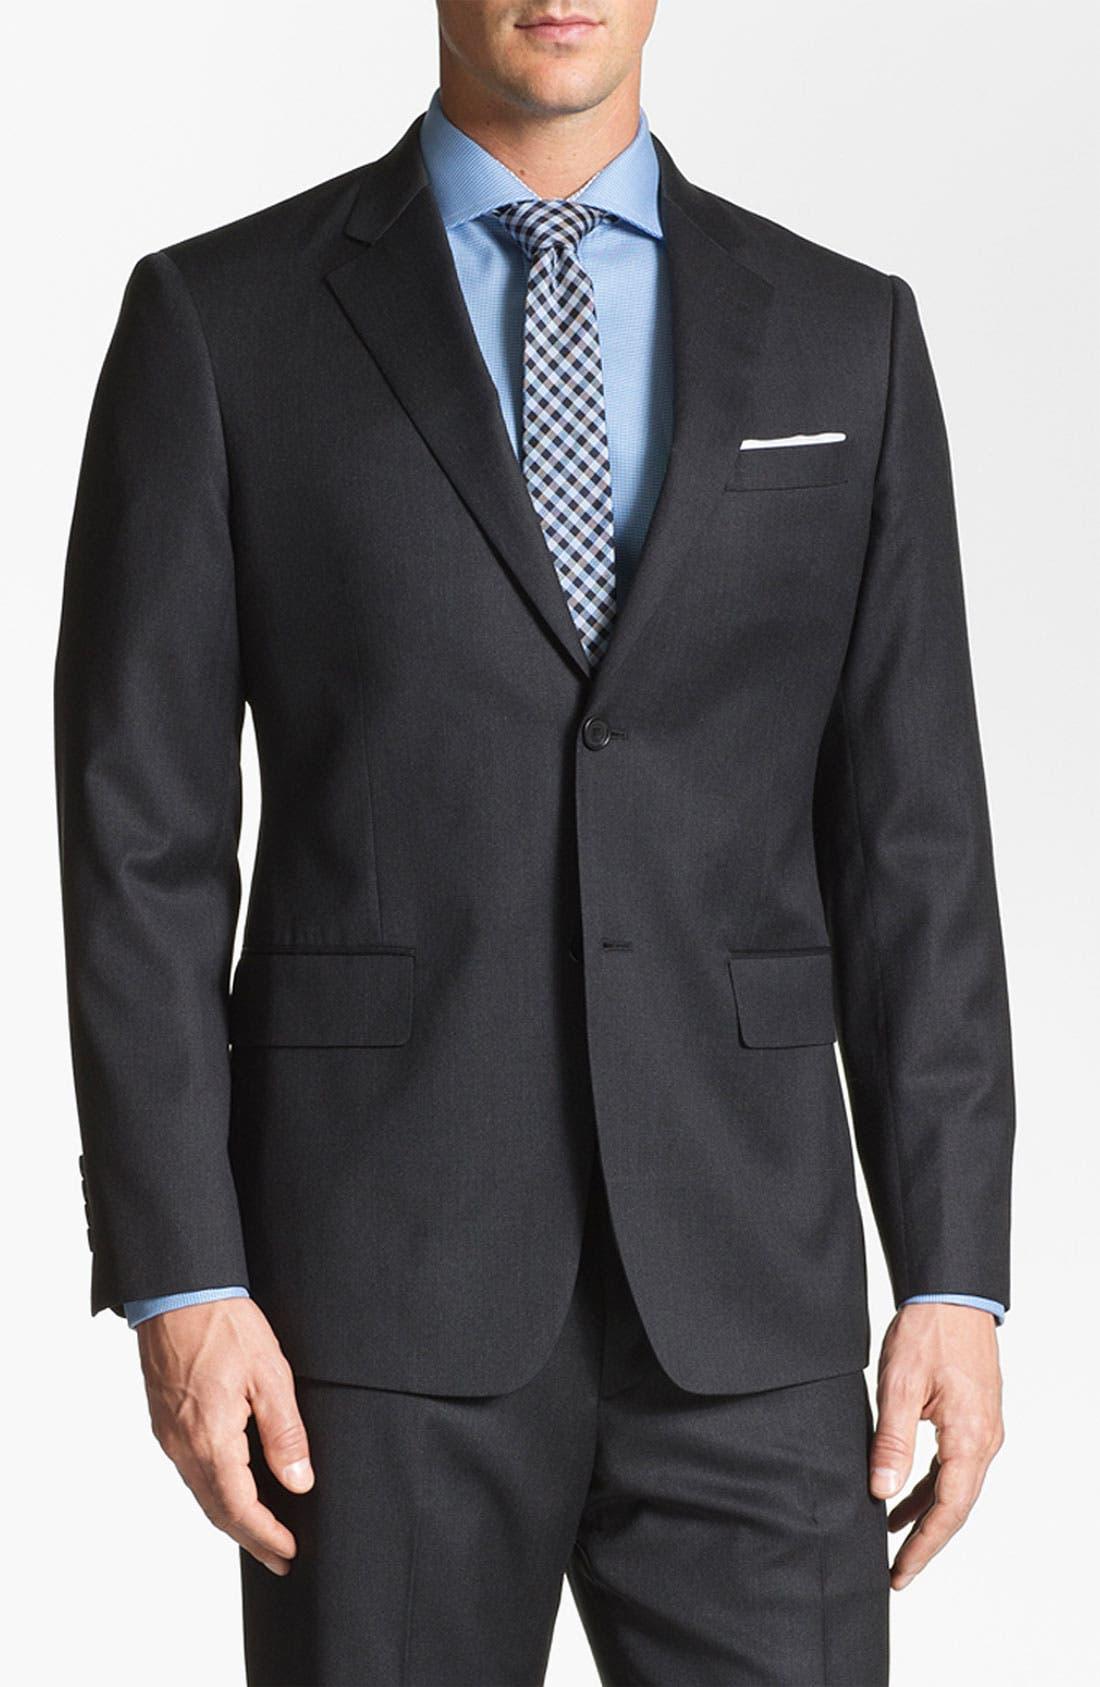 Alternate Image 3  - John W. Nordstrom 'Travel' Classic Fit Wool Suit